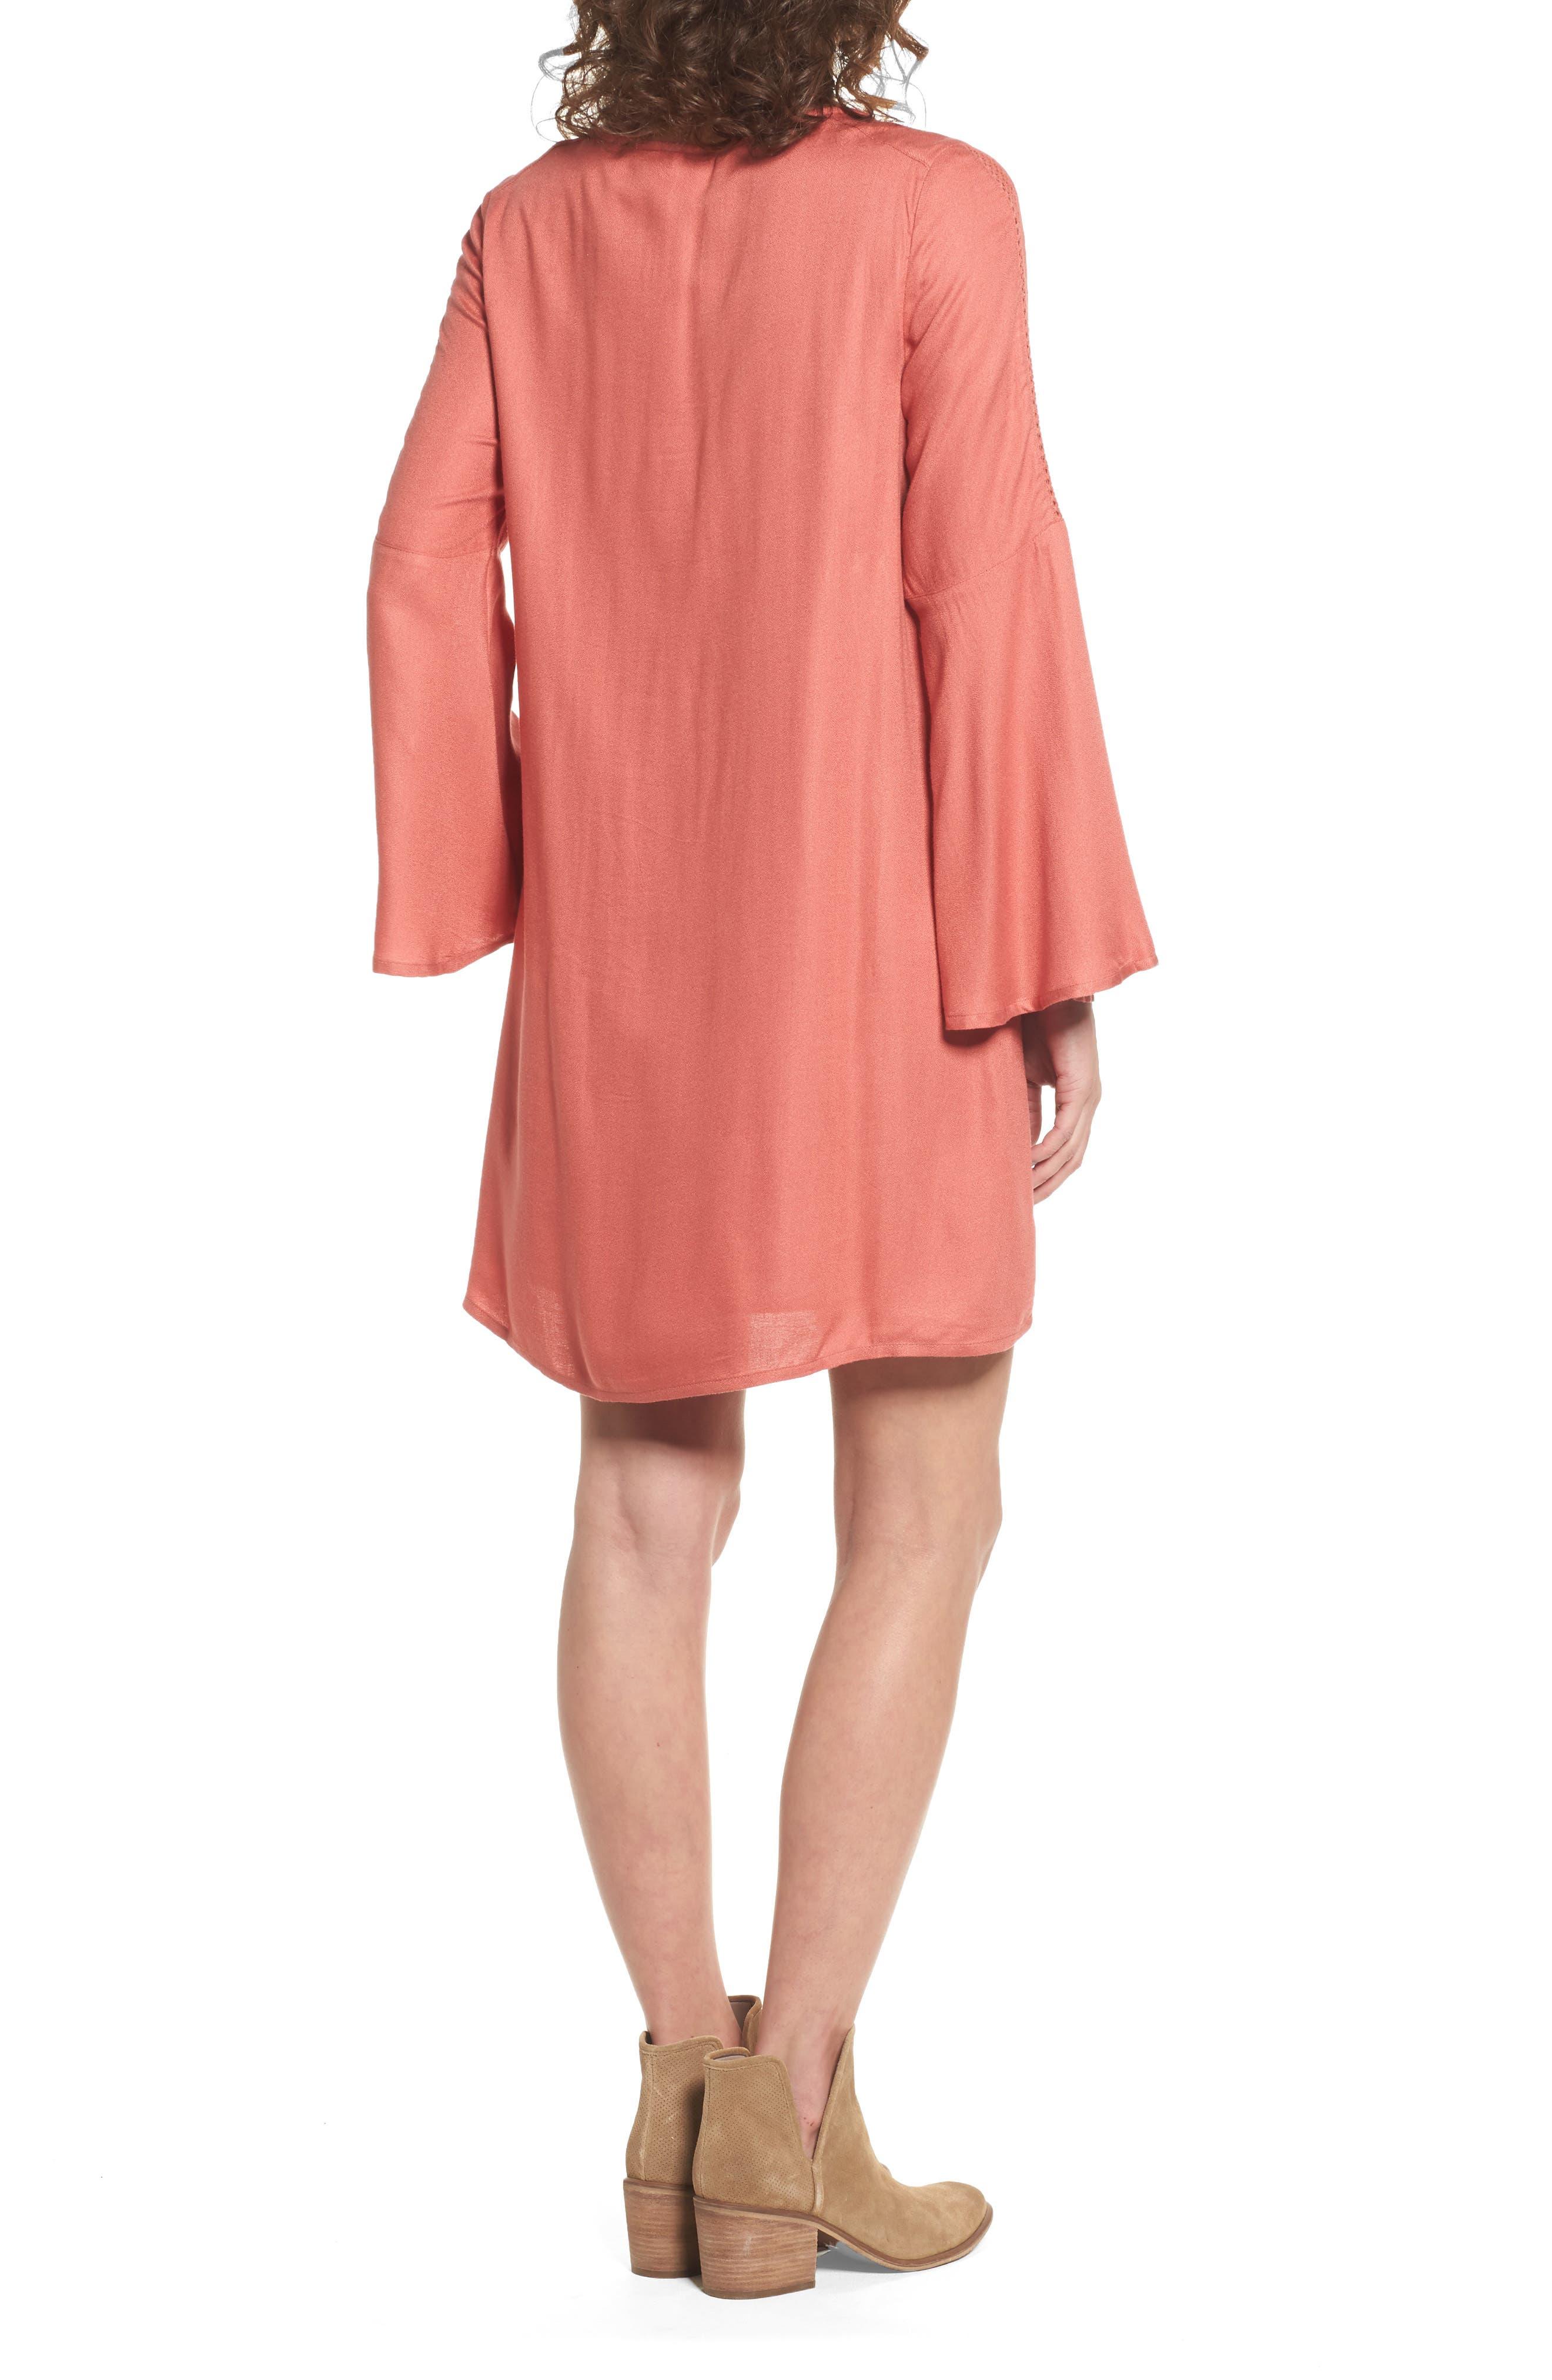 East Coast Dreamer Dress,                             Alternate thumbnail 4, color,